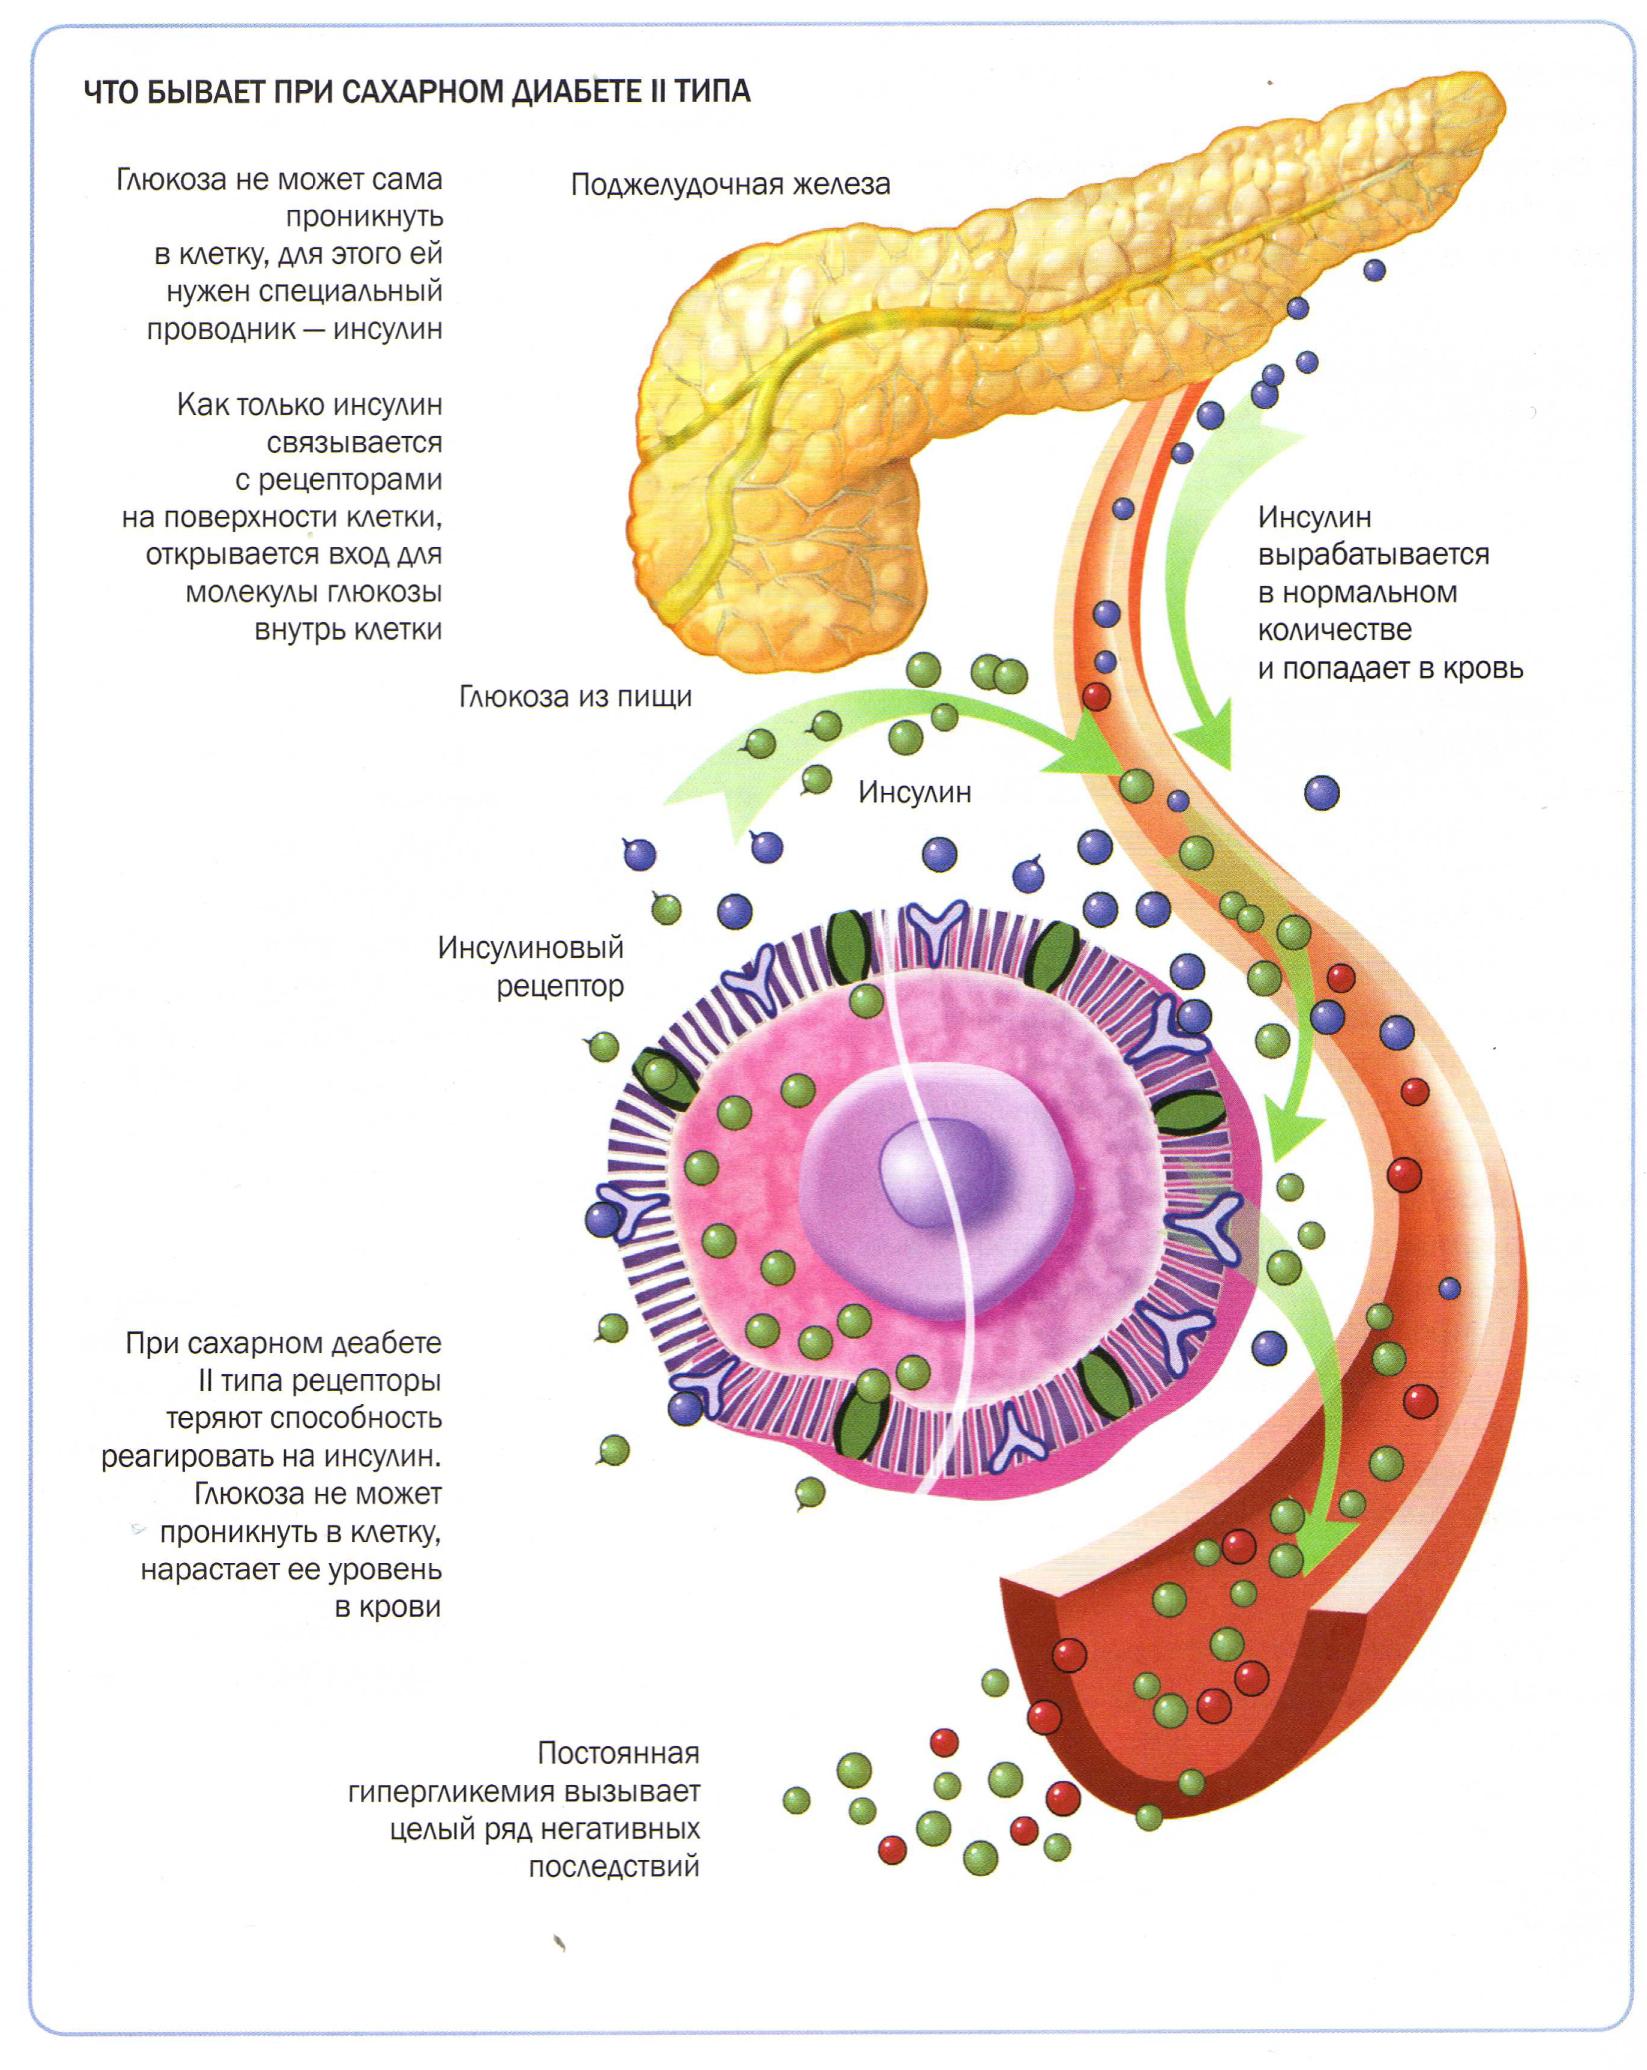 lekarstvo-pri-diabete-2-tipa-metformin